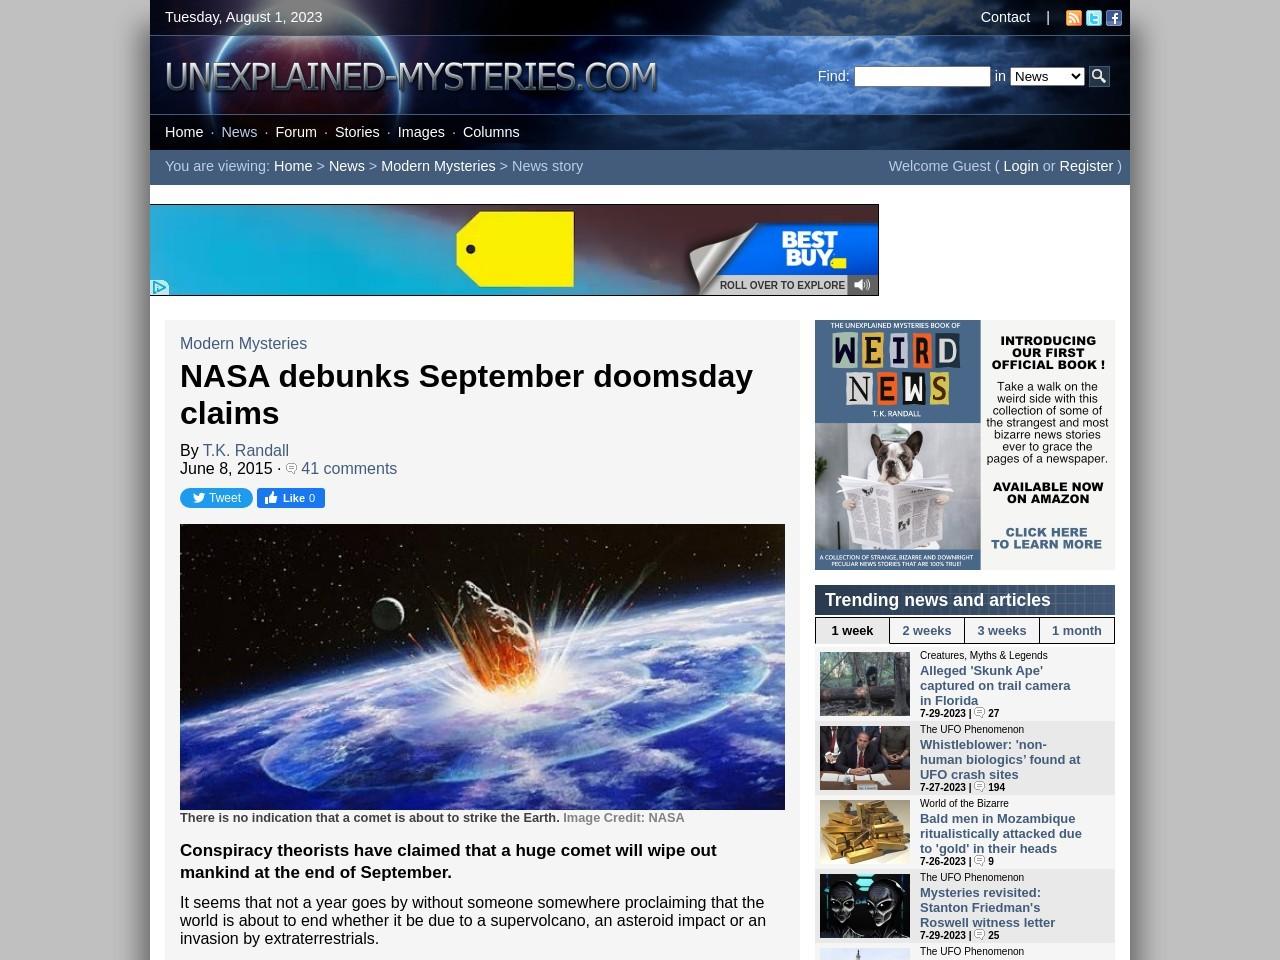 NASA debunks September doomsday claims